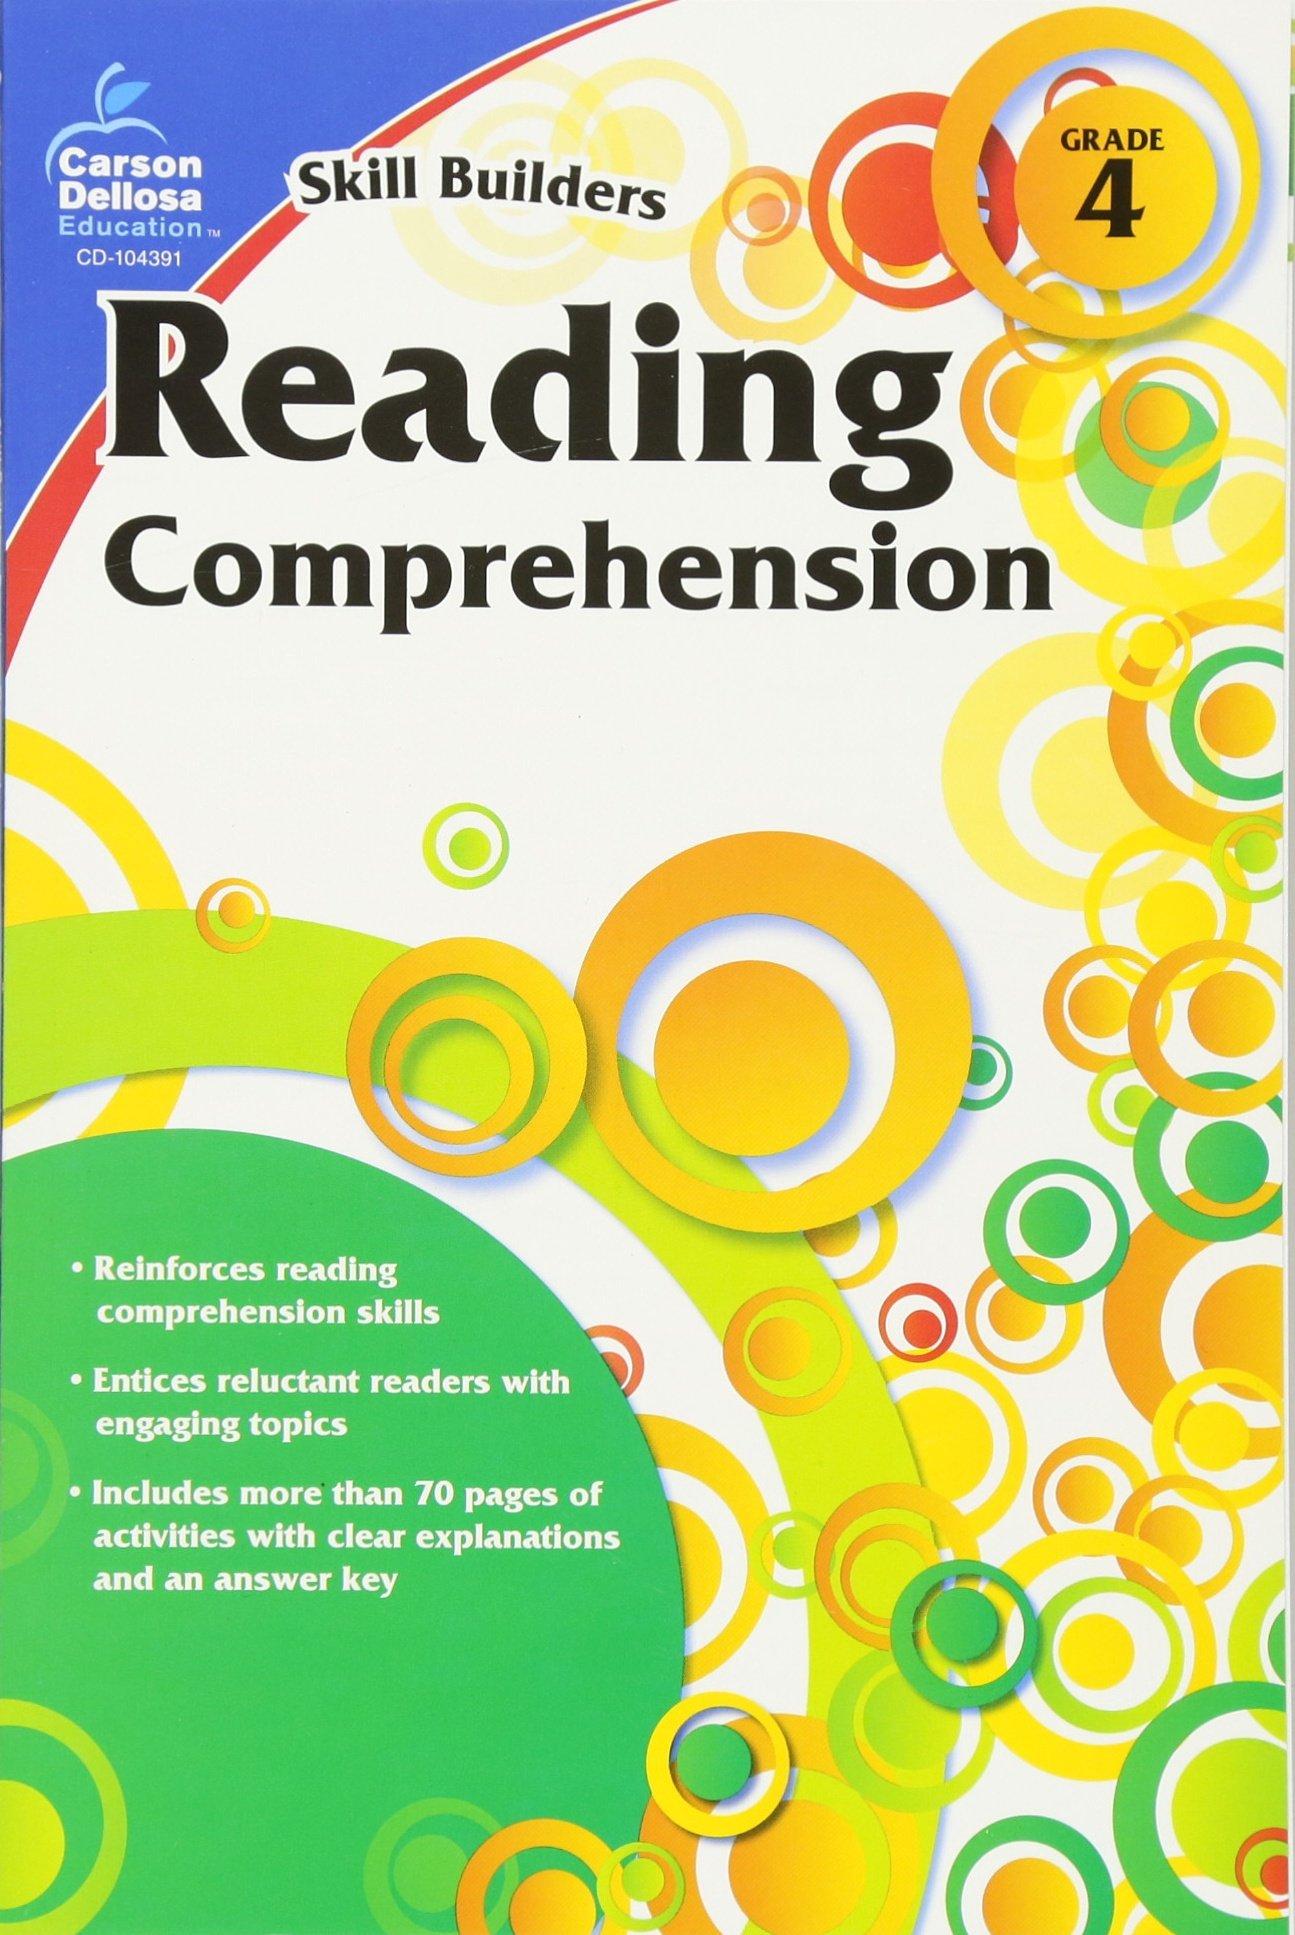 Reading Comprehension, Grade 4 (Skill Builders)